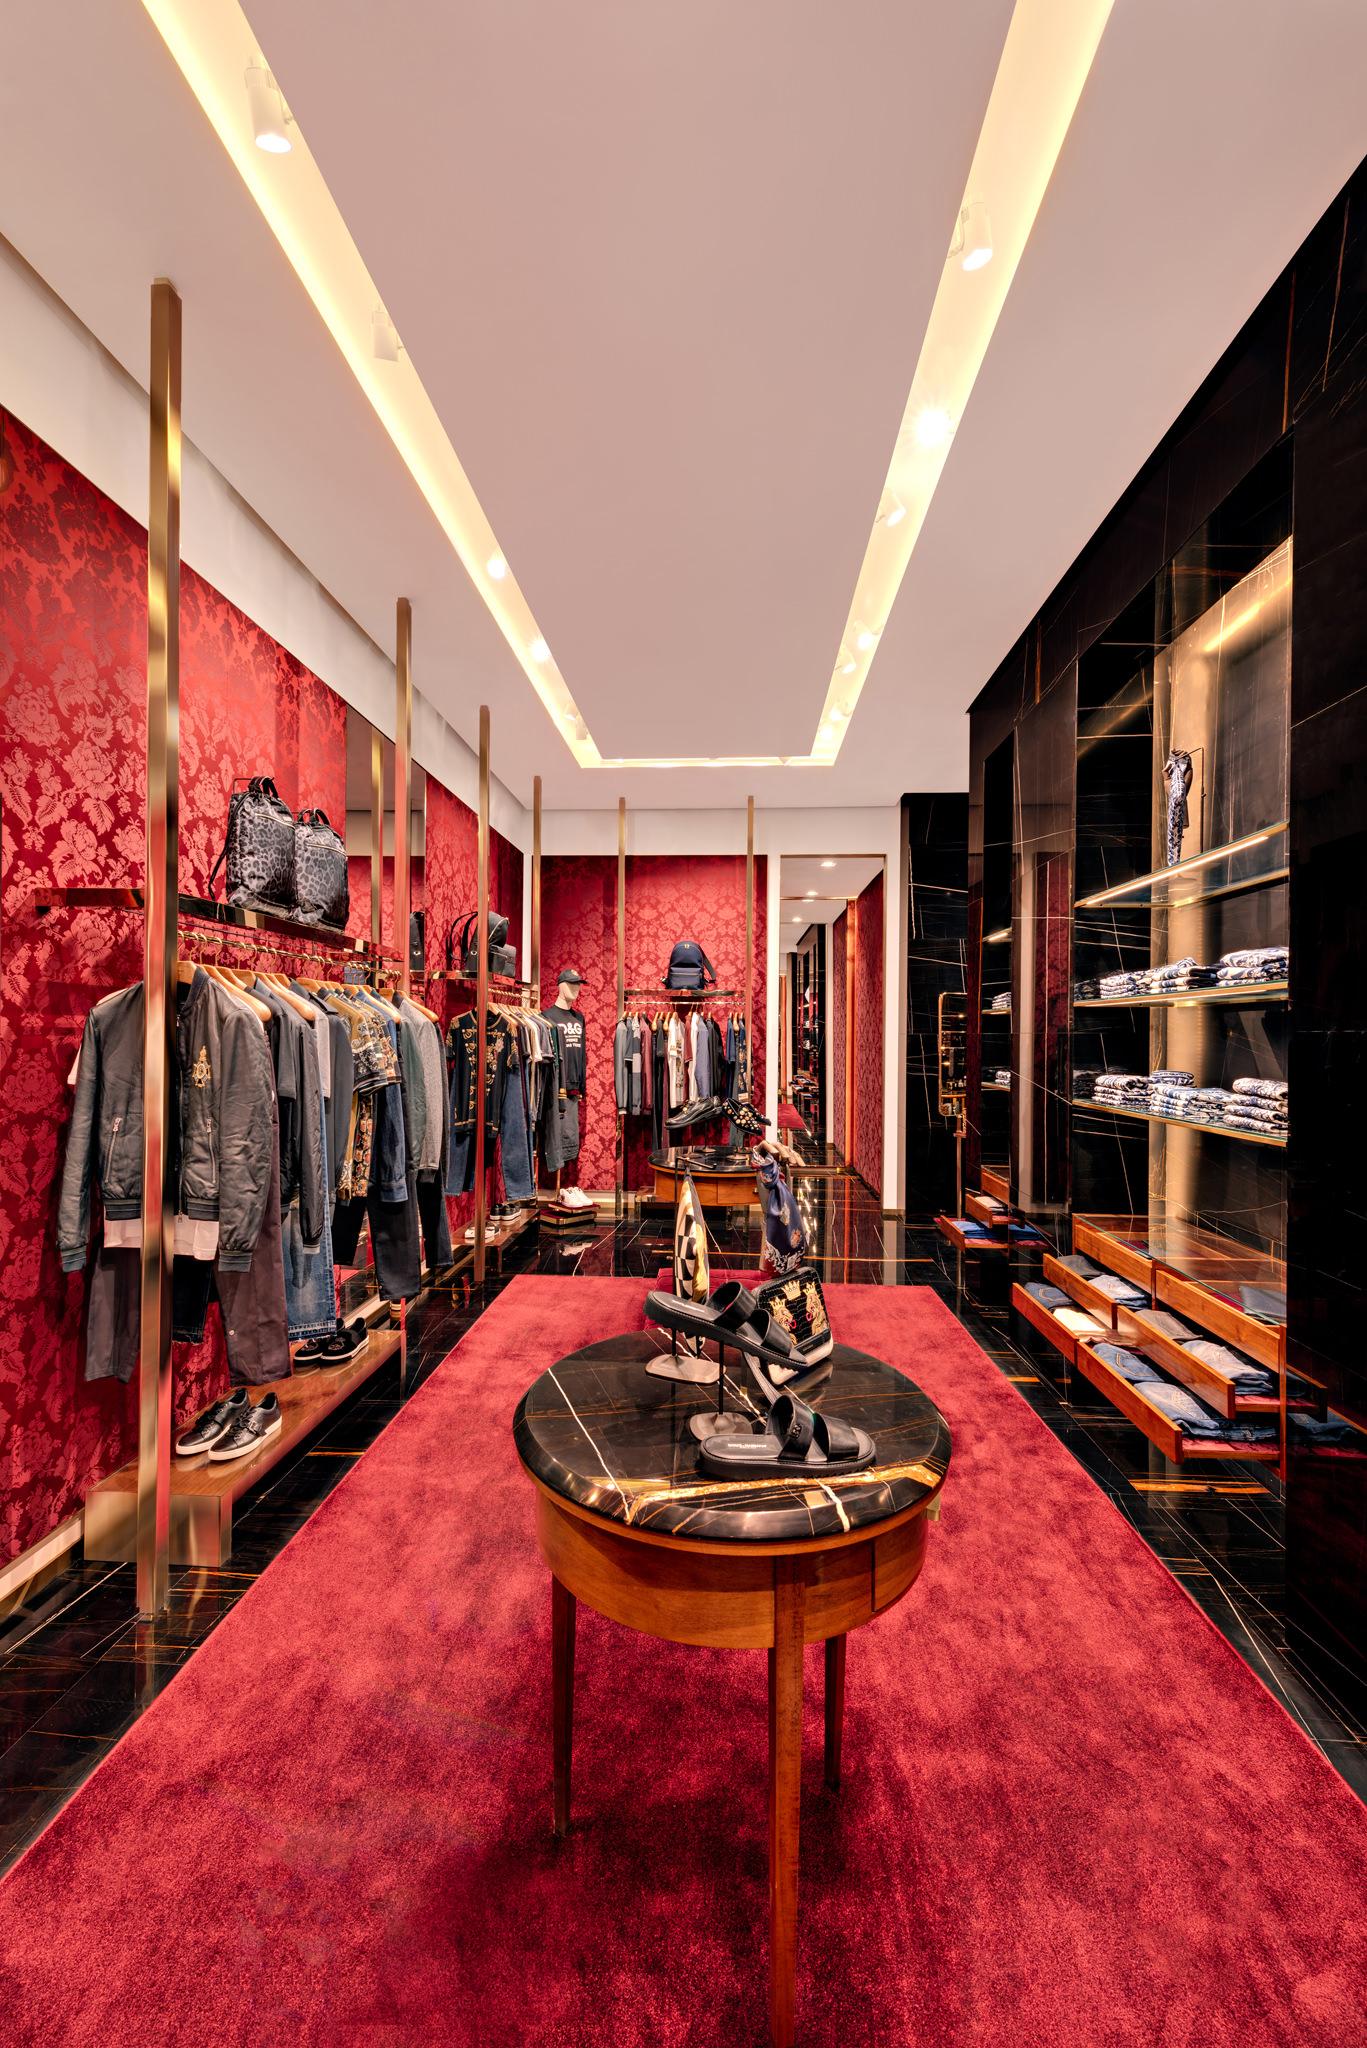 20171011 - Dolce & Gabbana - HCM - Commercial - Interior - Store - Retouch 0172.jpg